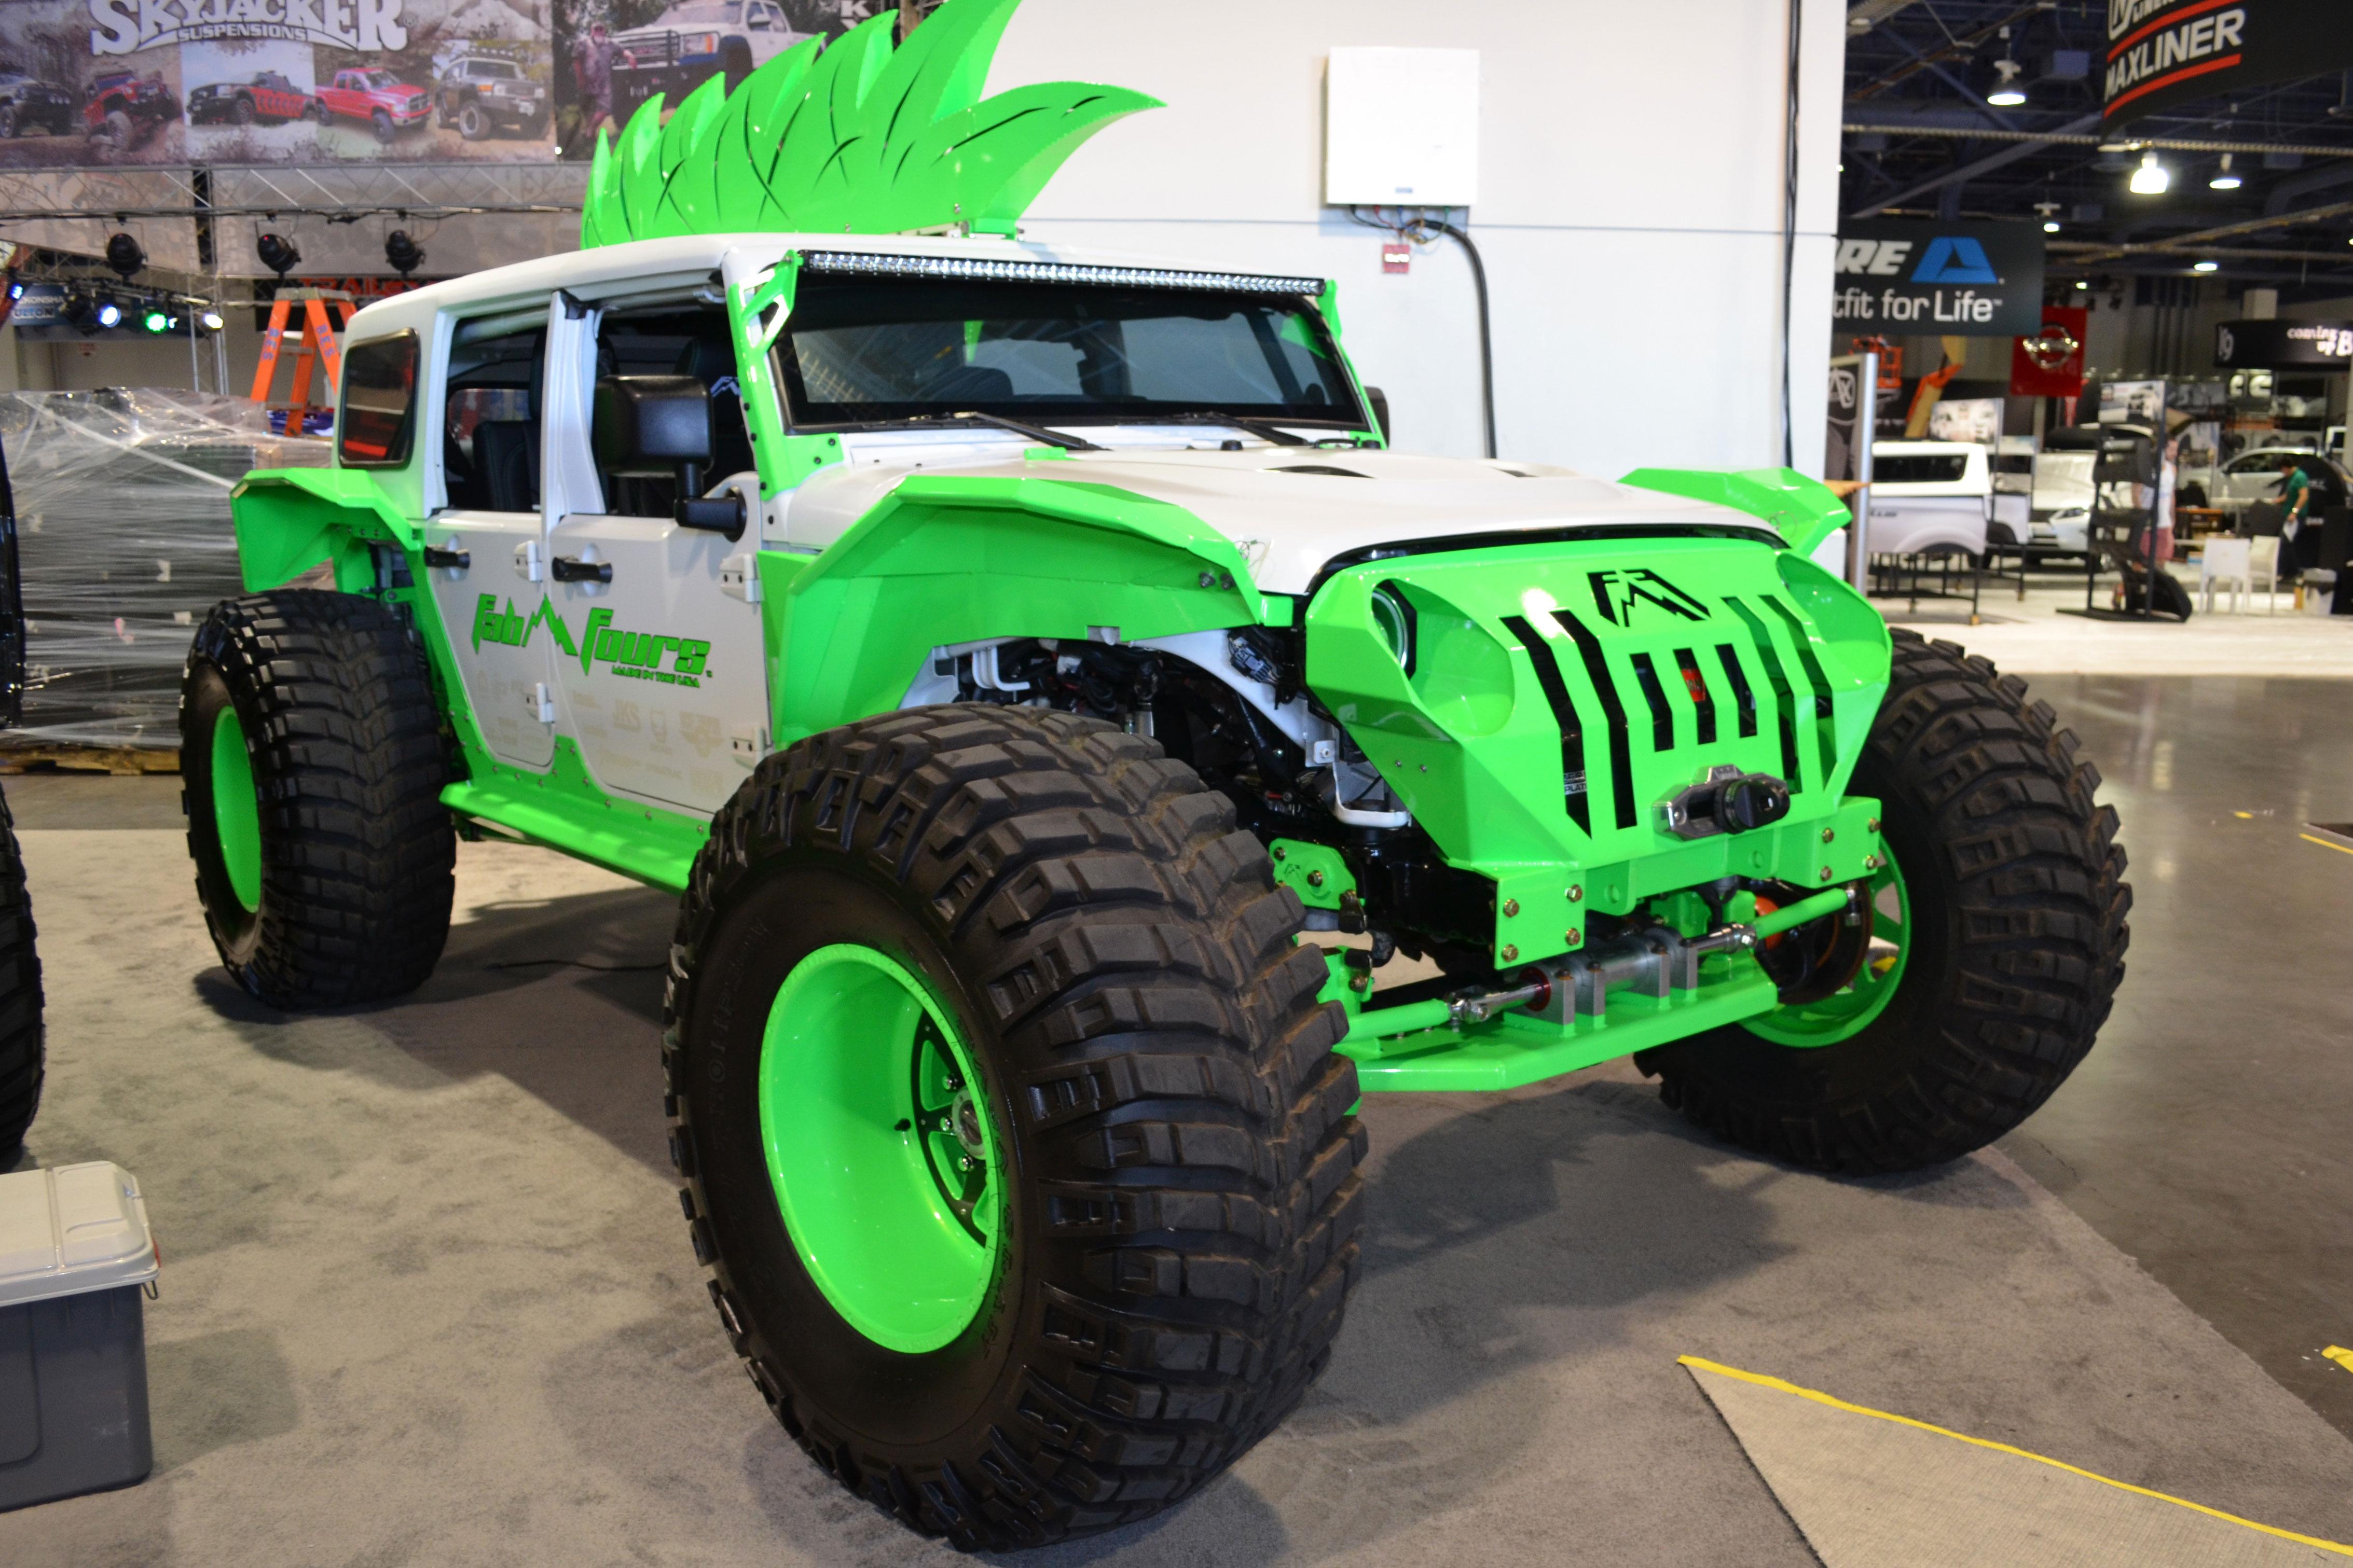 2015 SEMA Show Monday fab fours jeep